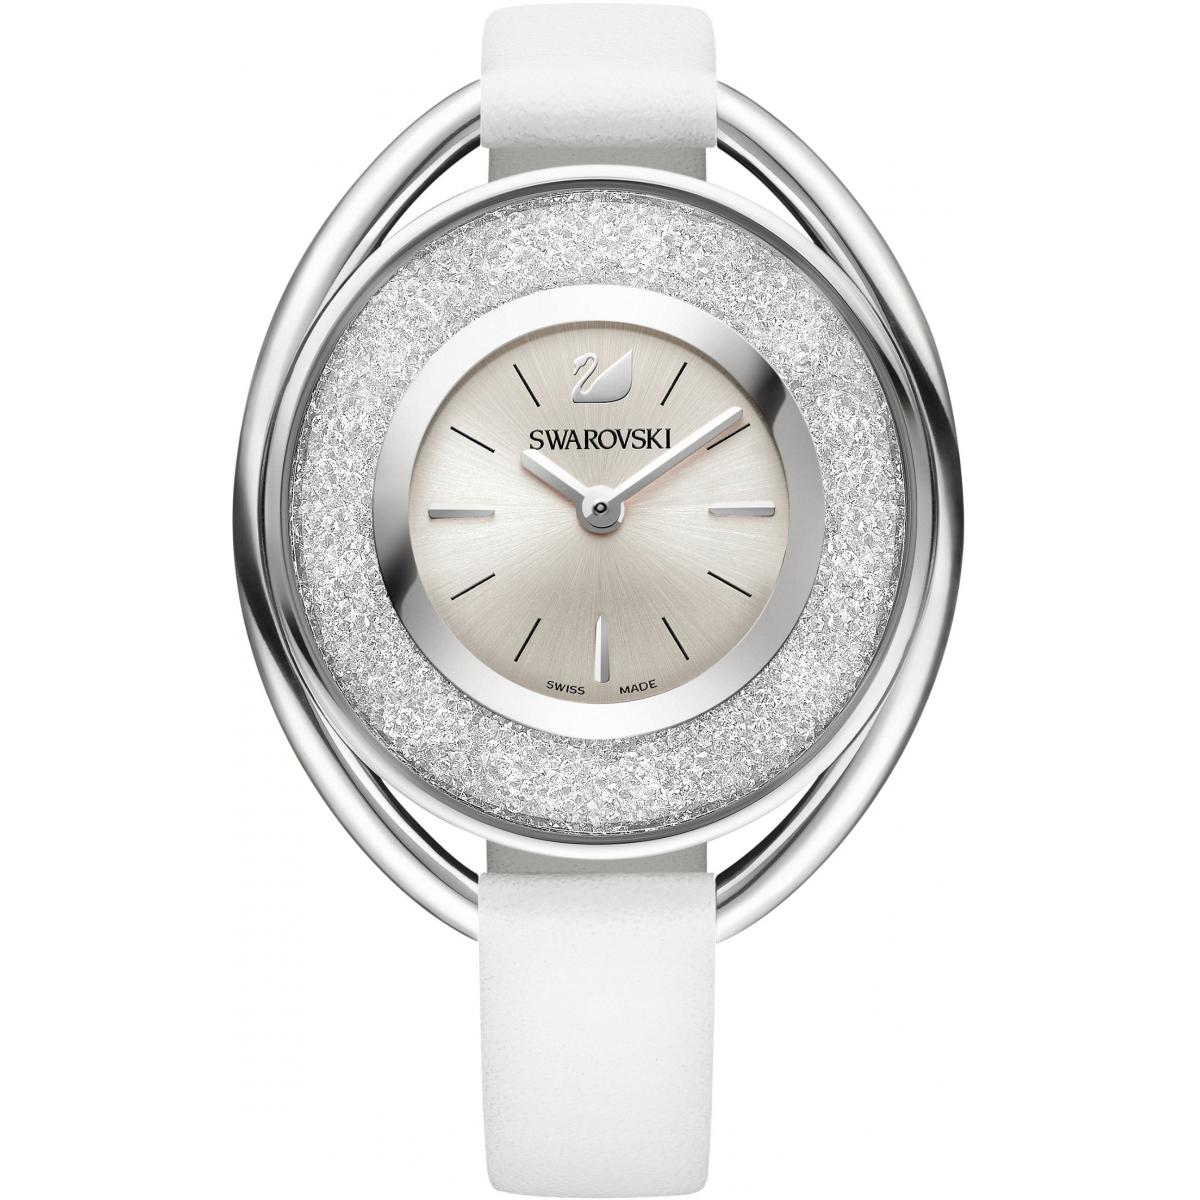 Montre Swarovski Crystalline 5158548 - Montre Ovale Argentée Femme